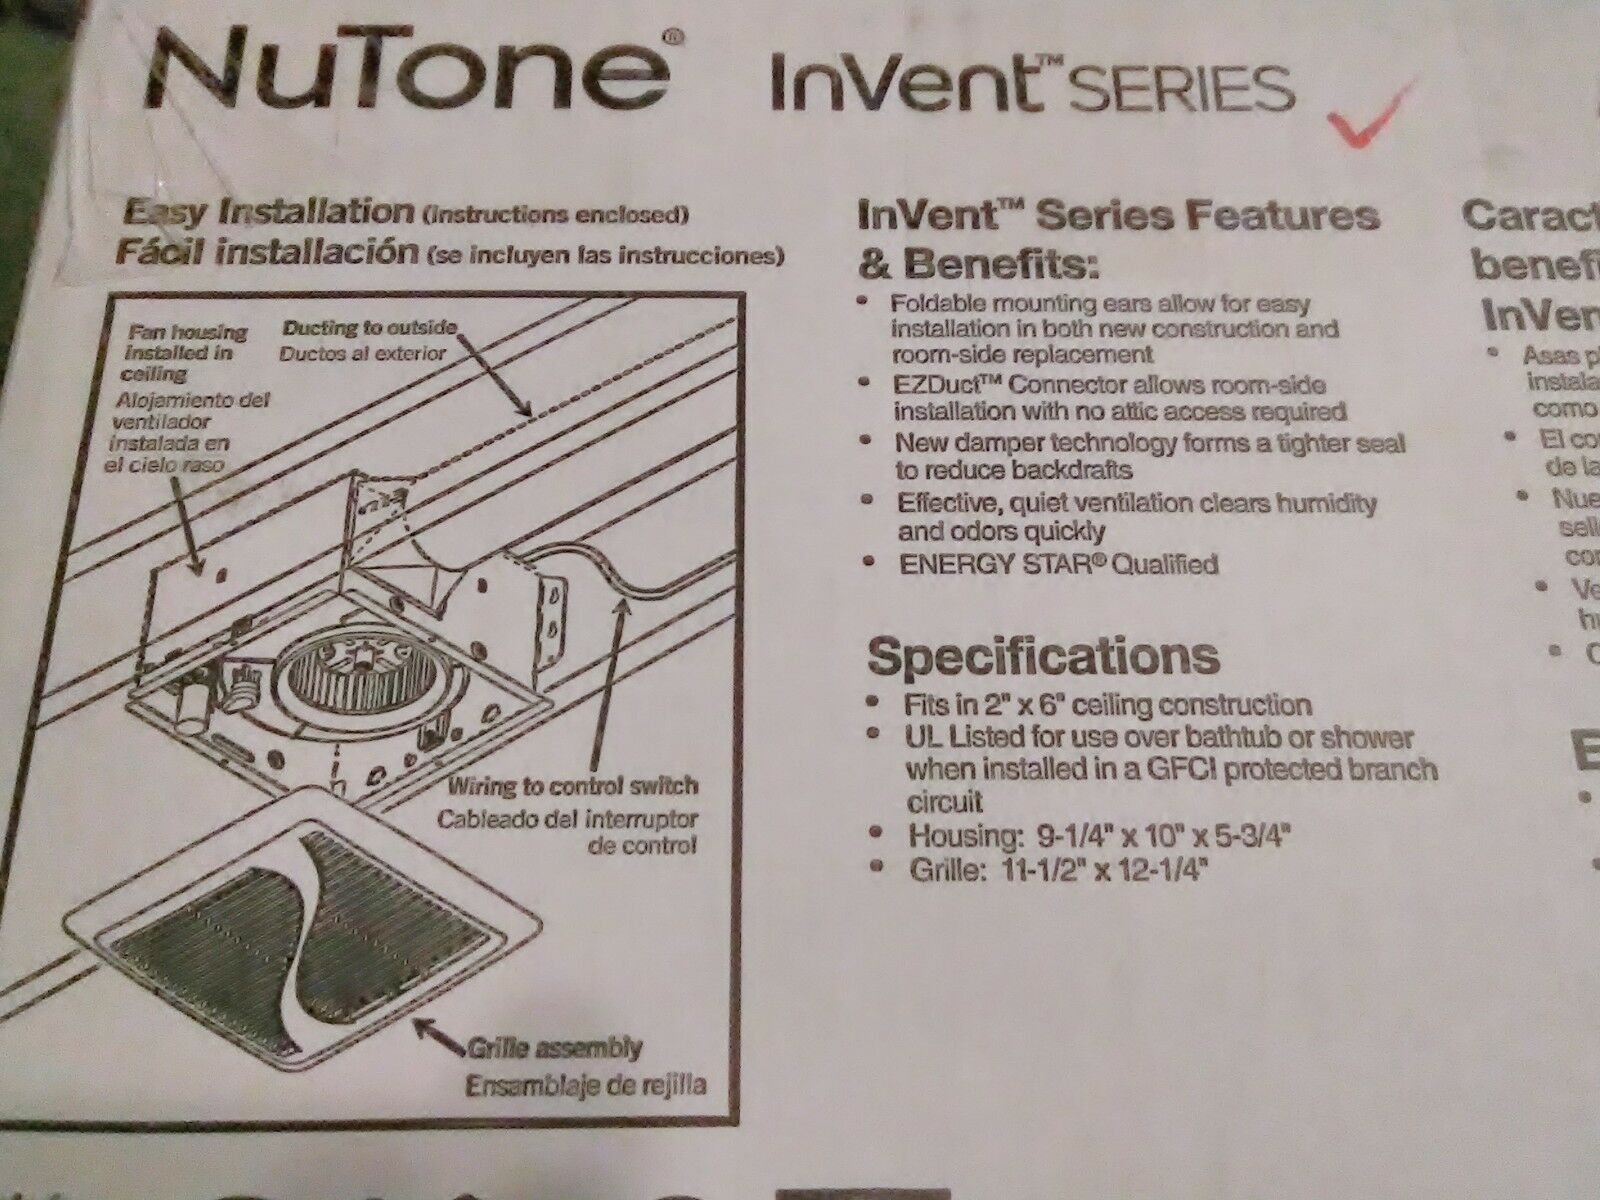 Nutone Invent Series 110 Cfm Ceiling Exhaust Bath Fan Energy Star Broan Fans Wiring Diagram Model 678 Aern110 Ebay